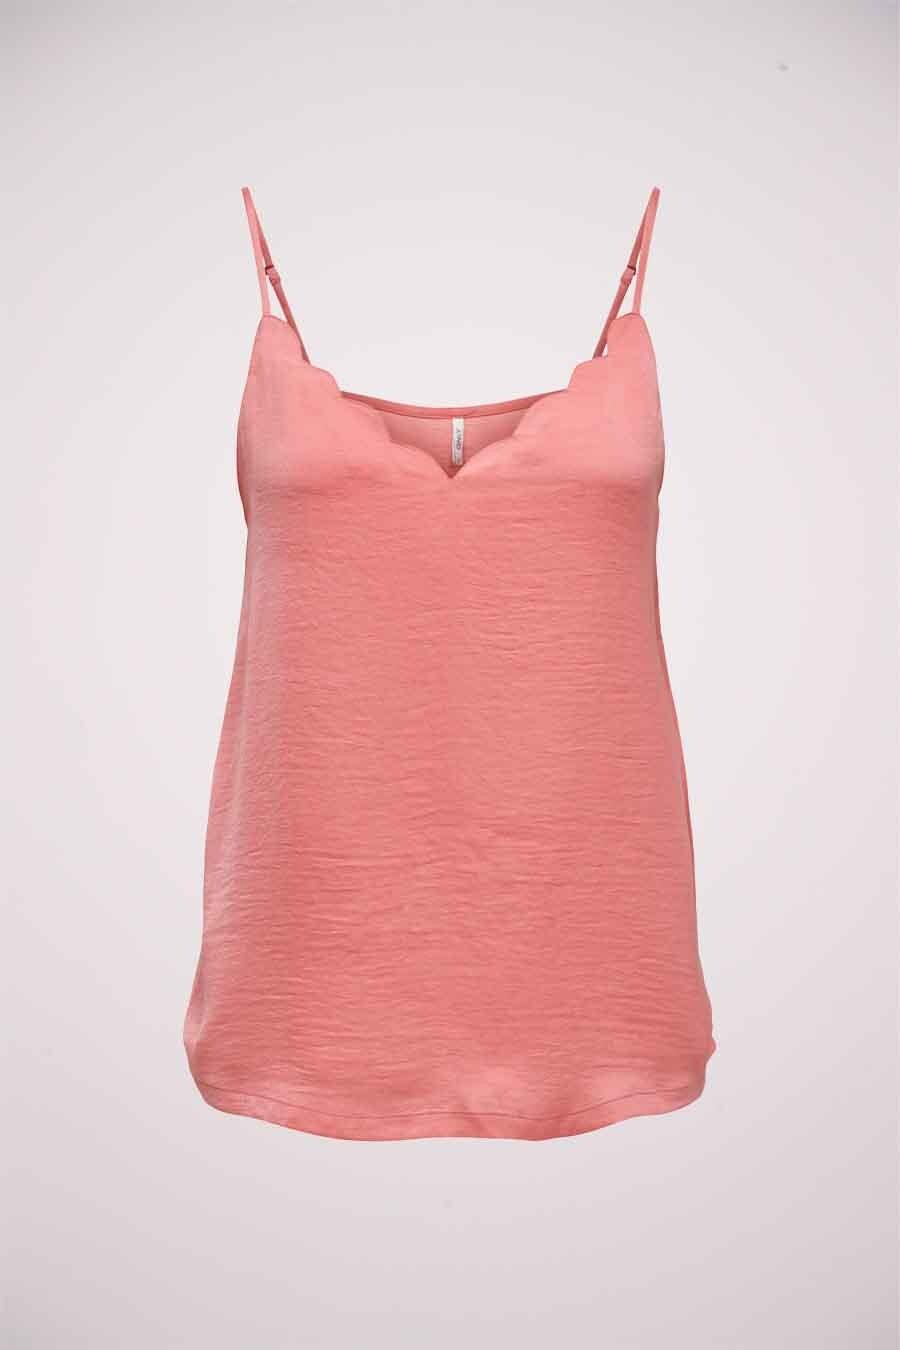 ONLY® Blouse zonder mouwen, Roze, Dames, Maat: 38/42